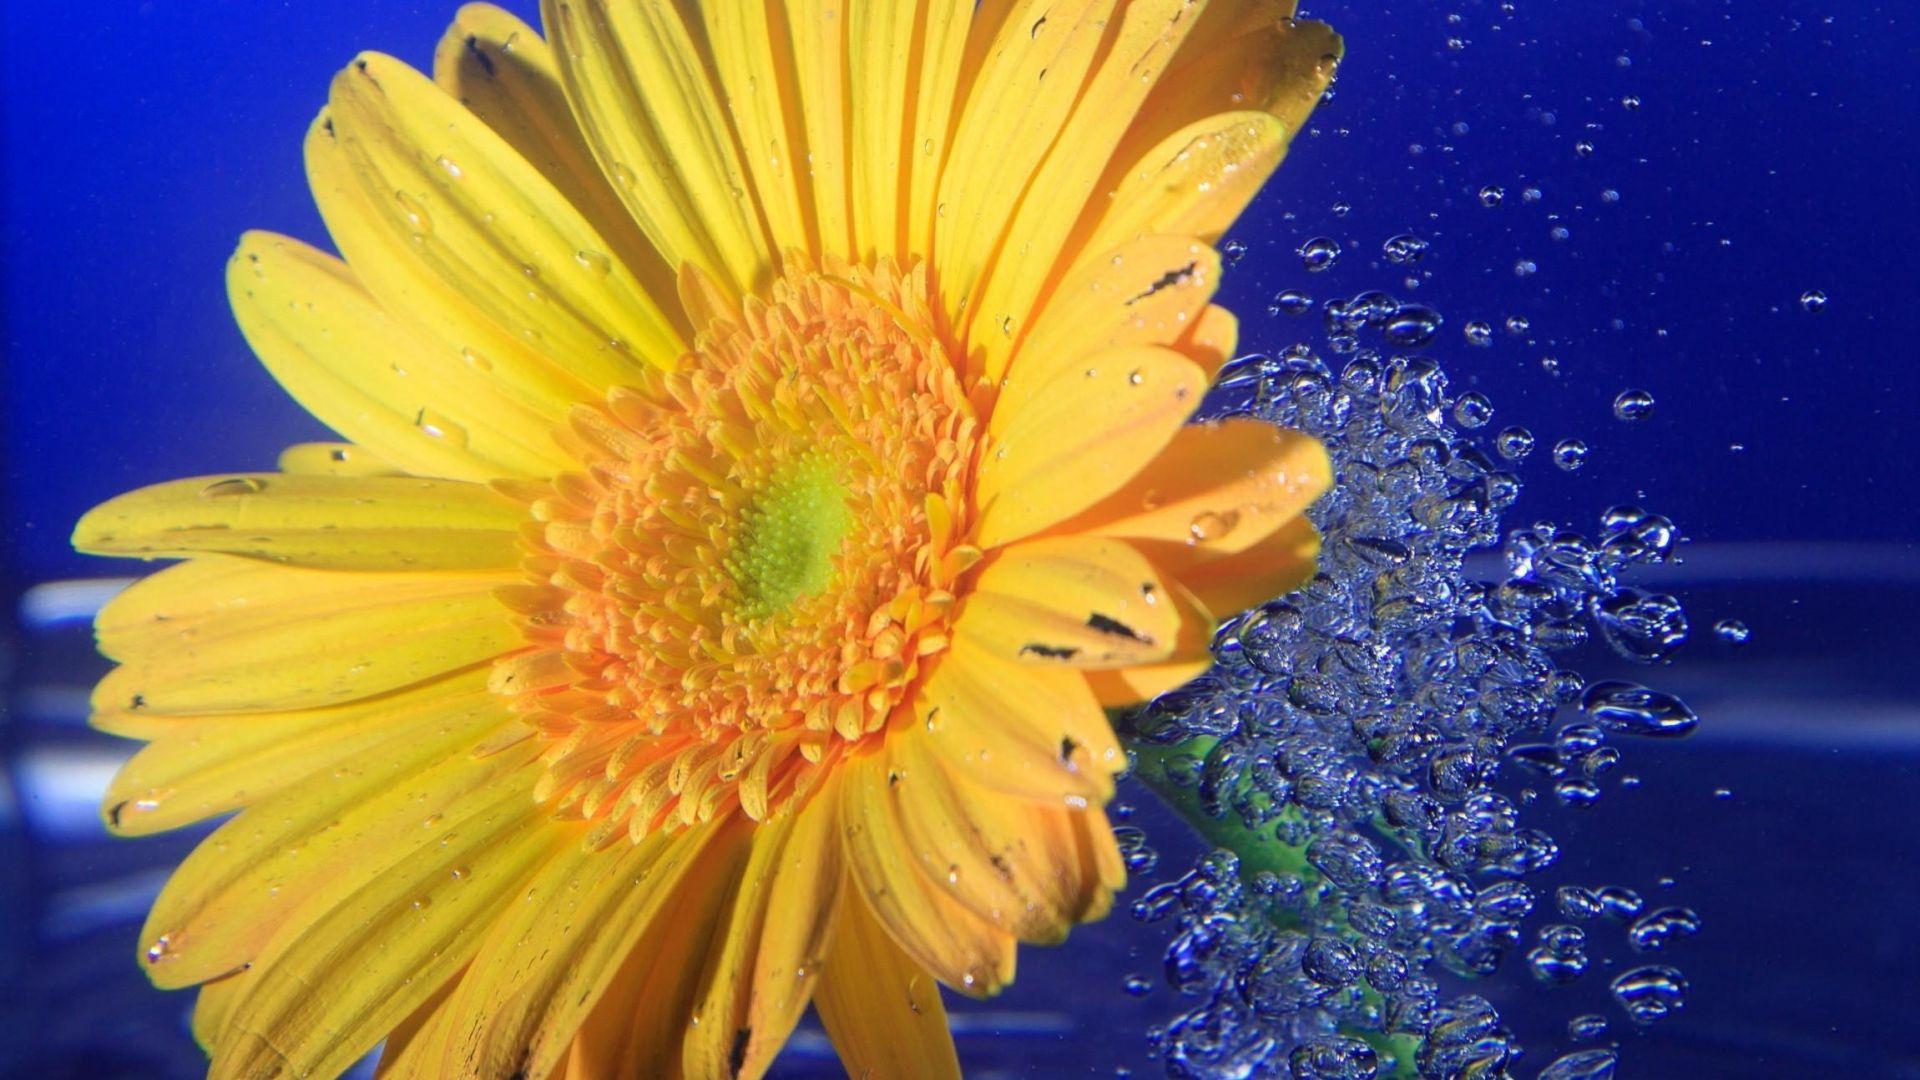 Google Image Result For Http Static Hothdwallpaper Net 517e1002926fb69765 Jpg Beautiful Flowers Images Flower Wallpaper Pink Flowers Wallpaper